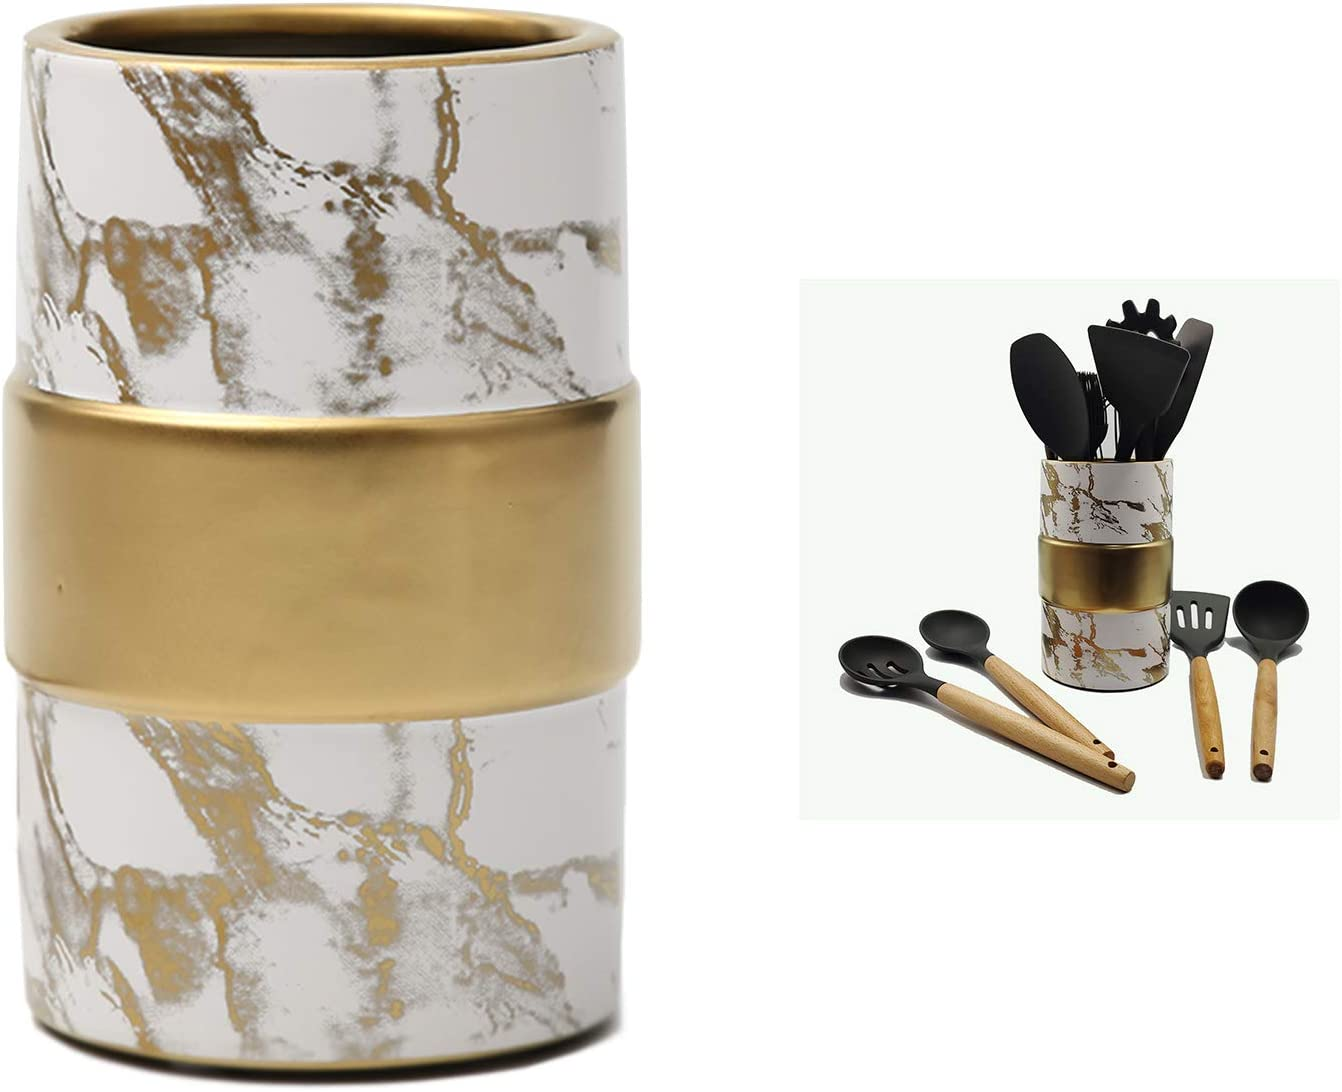 Aezek Kitchen Utensil Holder, Large Ceramic Utensils Crock, for Cooking Countertop, Utensil Holder for Wedding/Birthday/Housewarming Gift,Deep and Stable, Easy to Clean